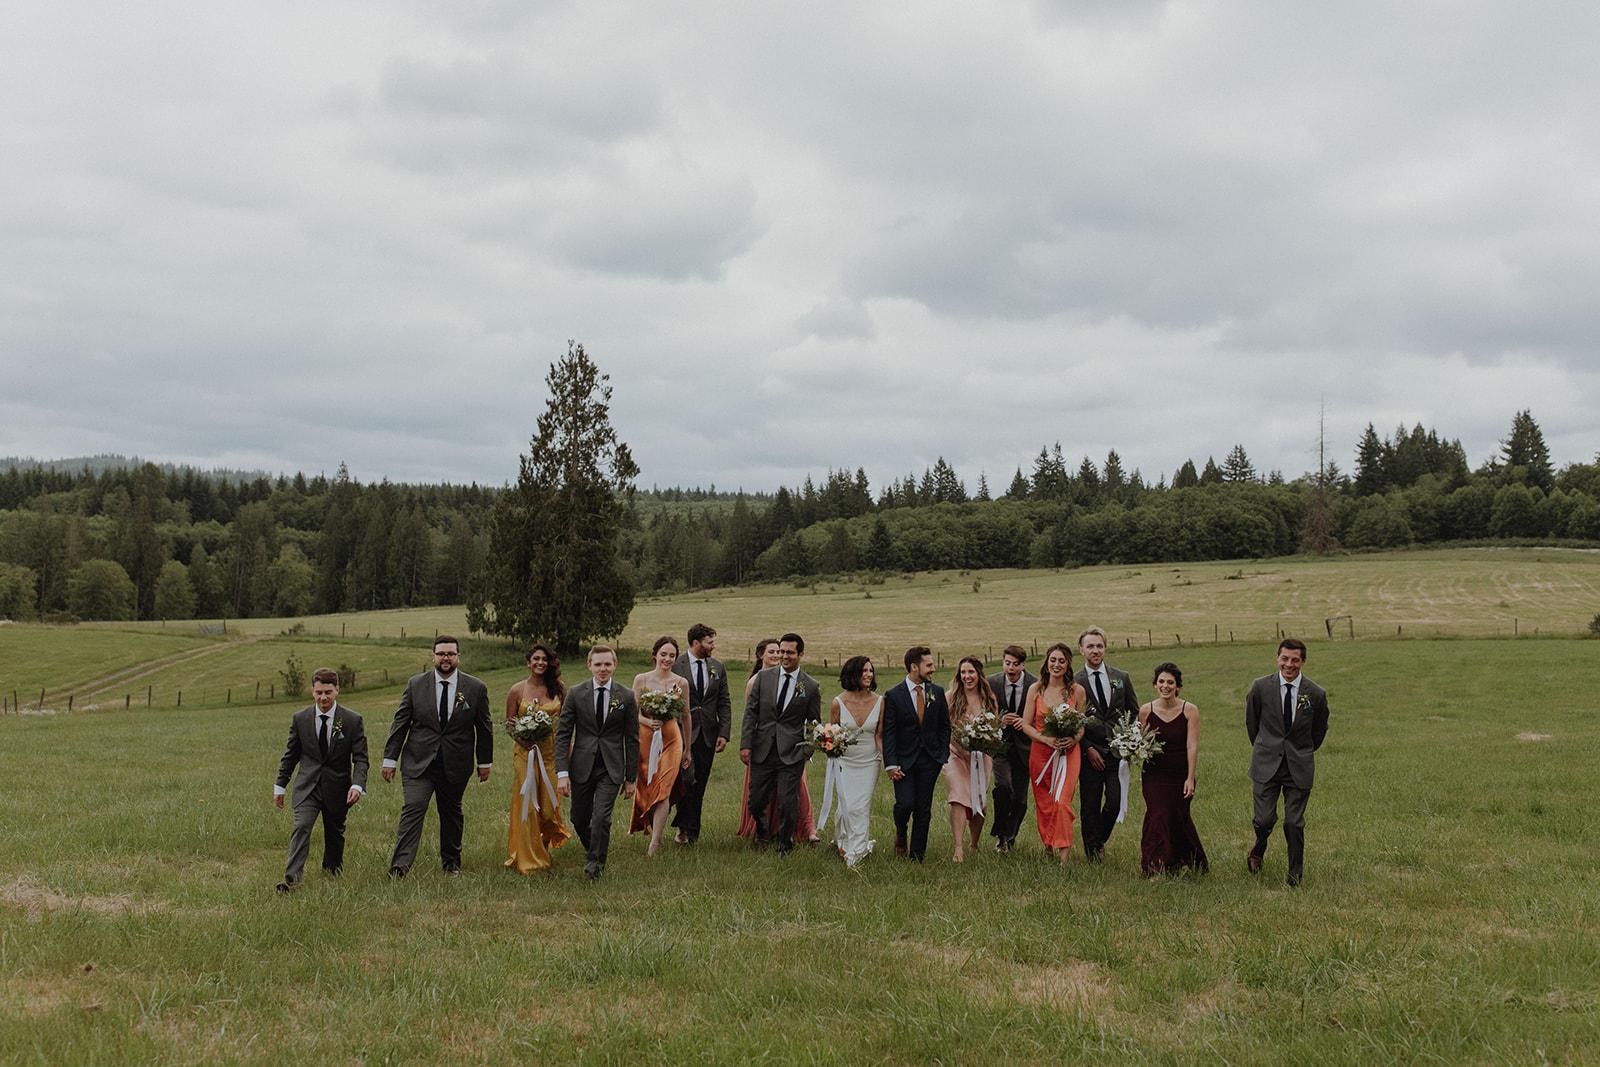 cortney_skye_wedding_june2019-195.jpg